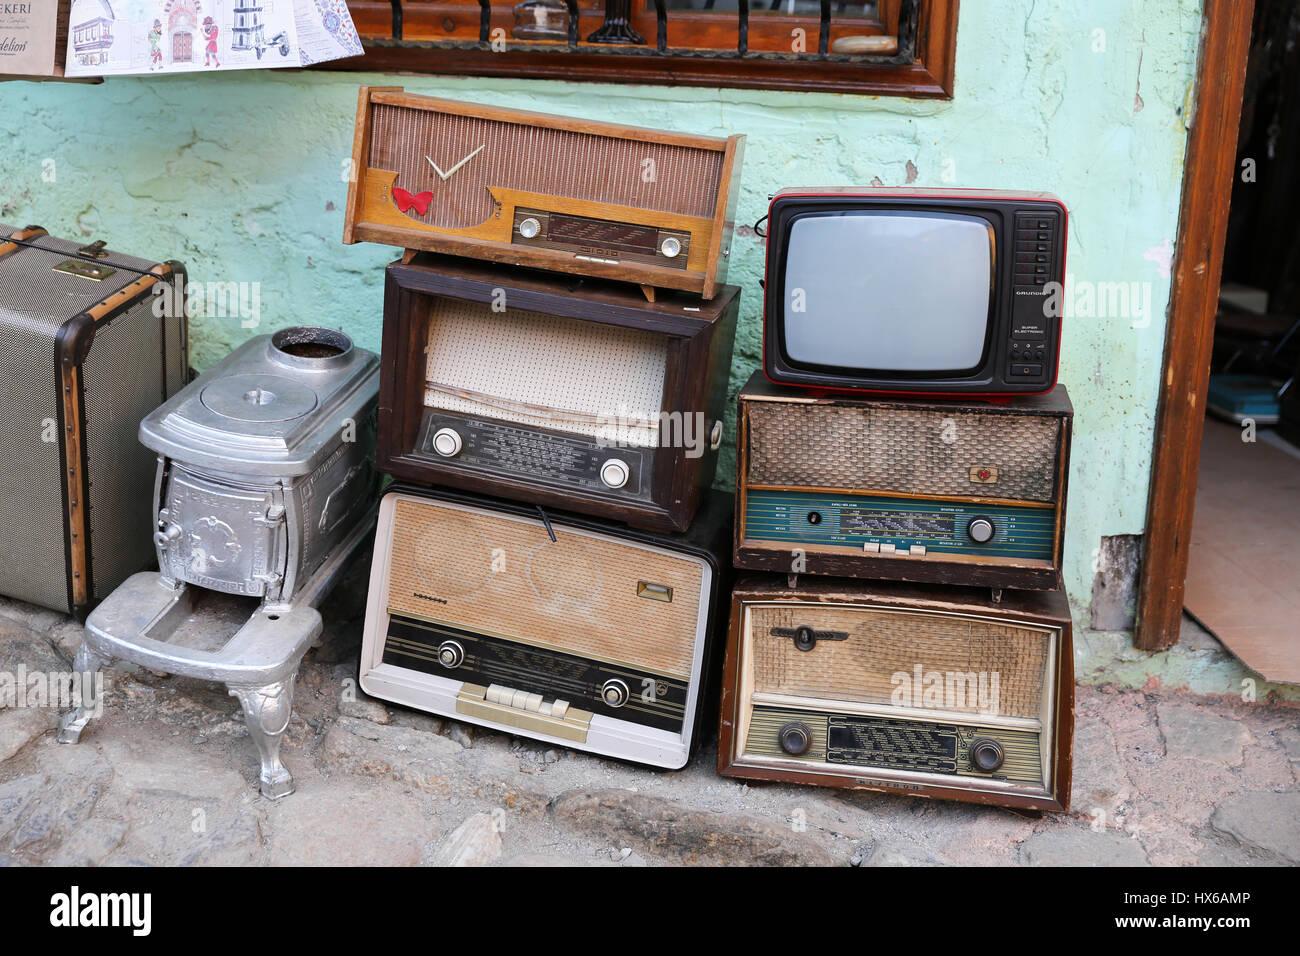 alte radios stockfotos alte radios bilder alamy. Black Bedroom Furniture Sets. Home Design Ideas